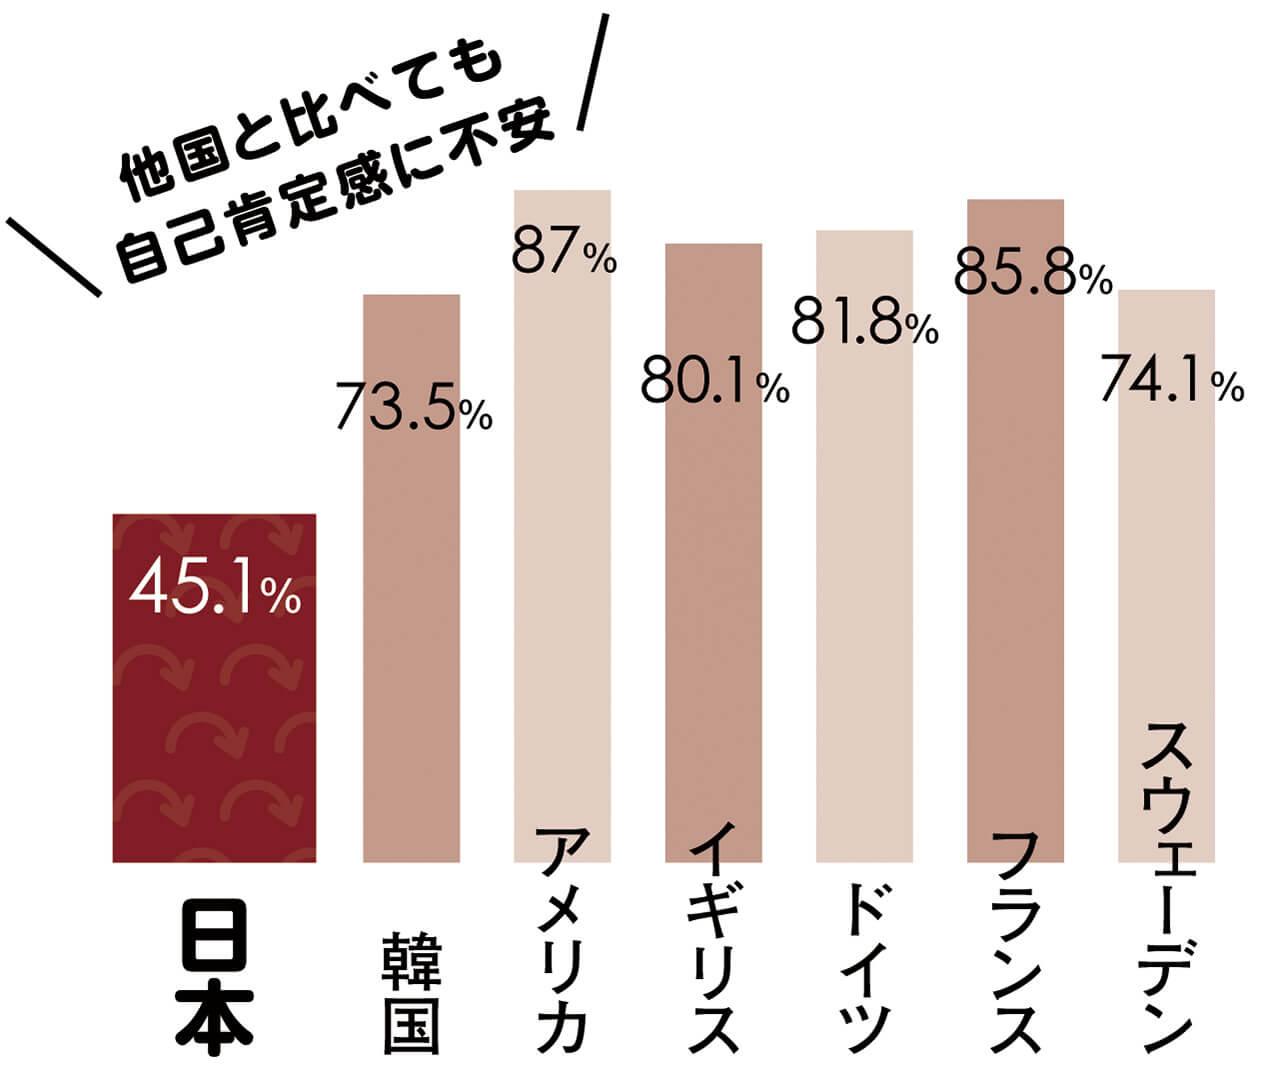 Q(世界の若者へ) 自分自身に満足している? スウェーデン 74.1% フランス 85.8% ドイツ 81.8% イギリス 80.1%  アメリカ 87% 韓国 73.5% 日本 45.1%  他国と比べても自己肯定感に不安 出典:令和元年版 子供・若者白書(内閣府)より